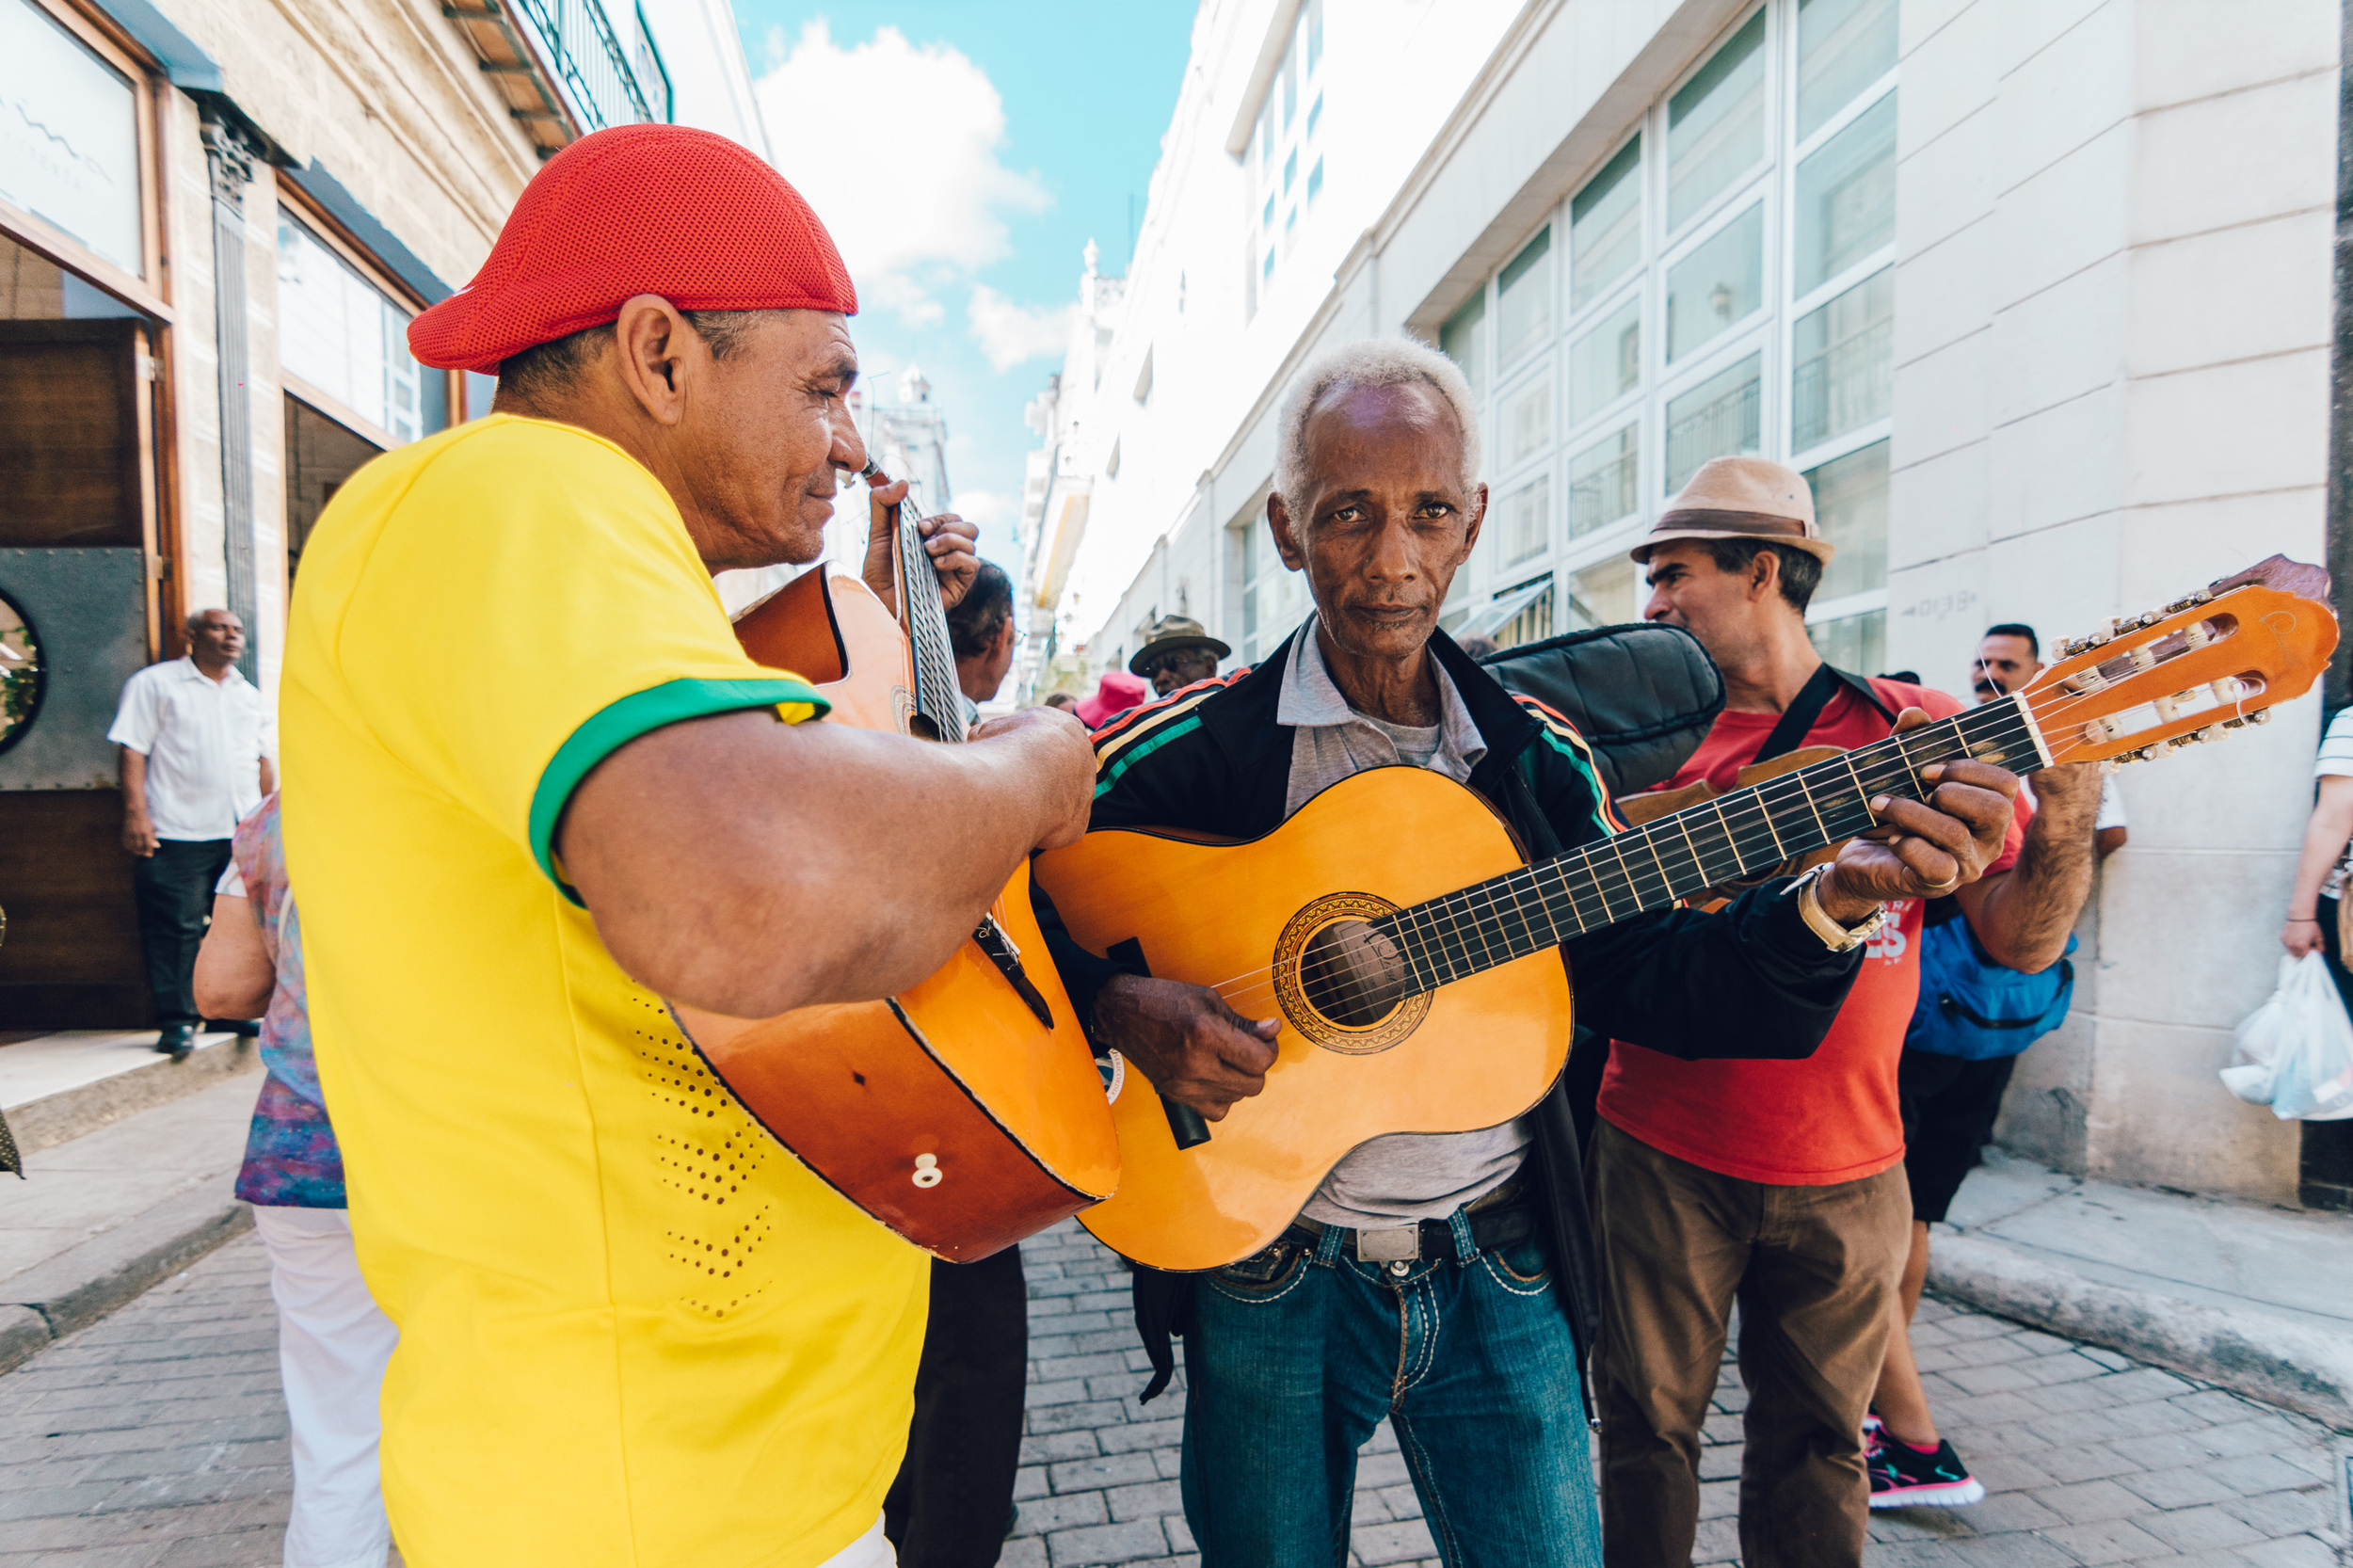 DeClaro-Photography-Cuba-02315.jpg